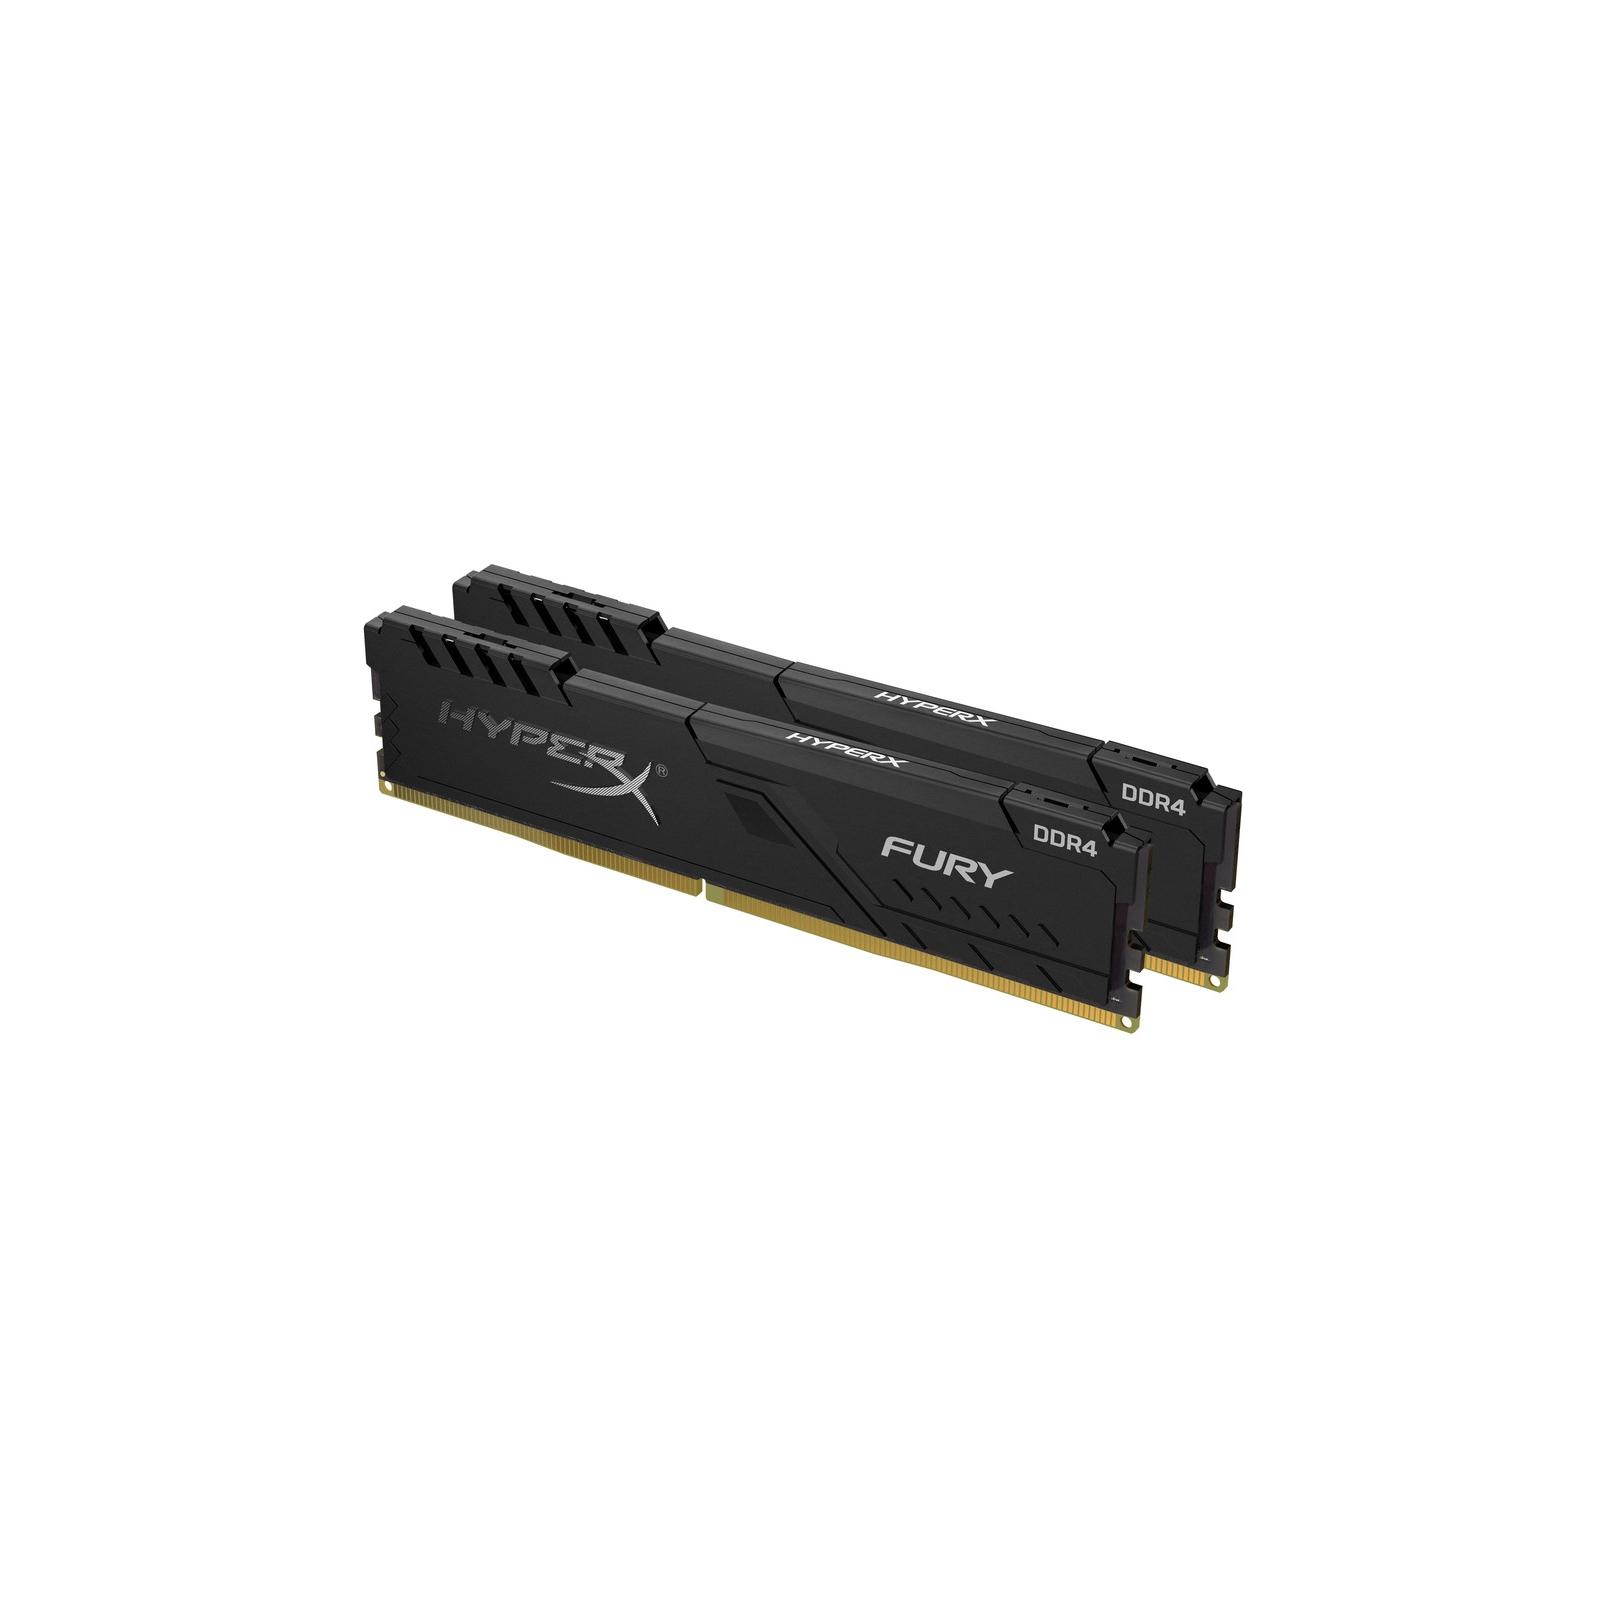 Модуль памяти для компьютера DDR4 8GB (2x4GB) 3200 MHz HyperX Fury Black HyperX (Kingston Fury) (HX432C16FB3K2/8) изображение 3